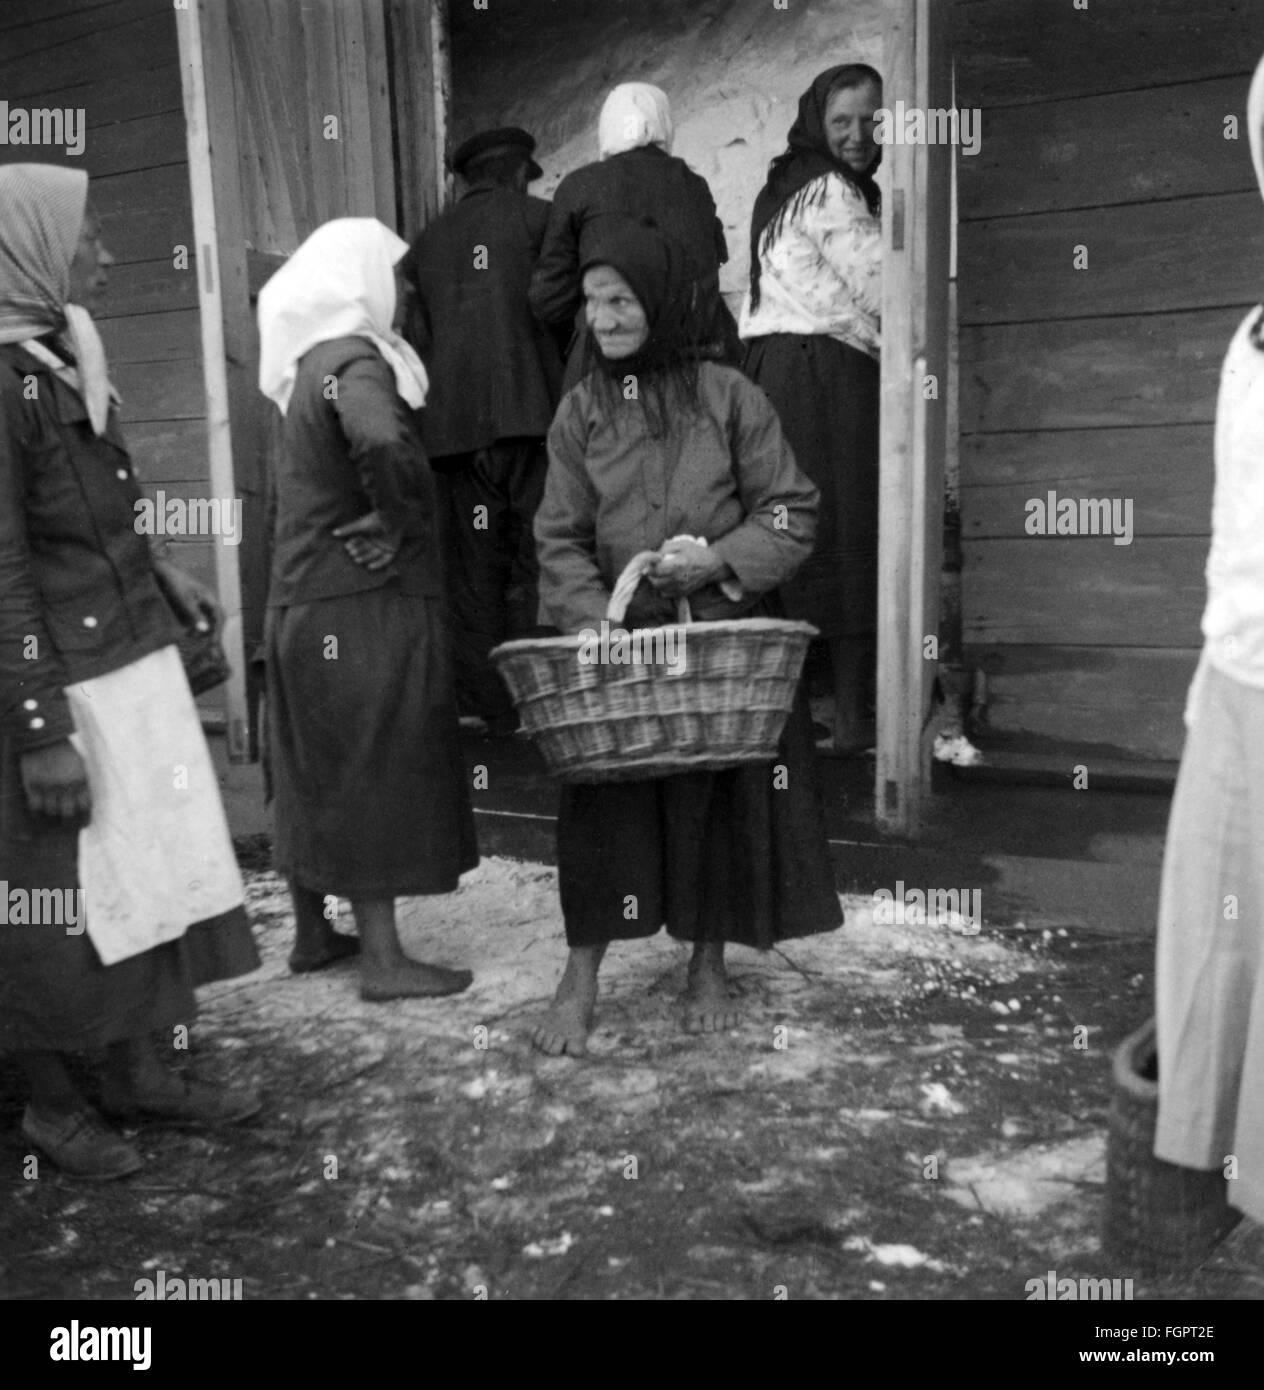 Second World War / WWII, Soviet Union, civilian population, summer 1941, Ukrainian women queuing for flour, photo - Stock Image